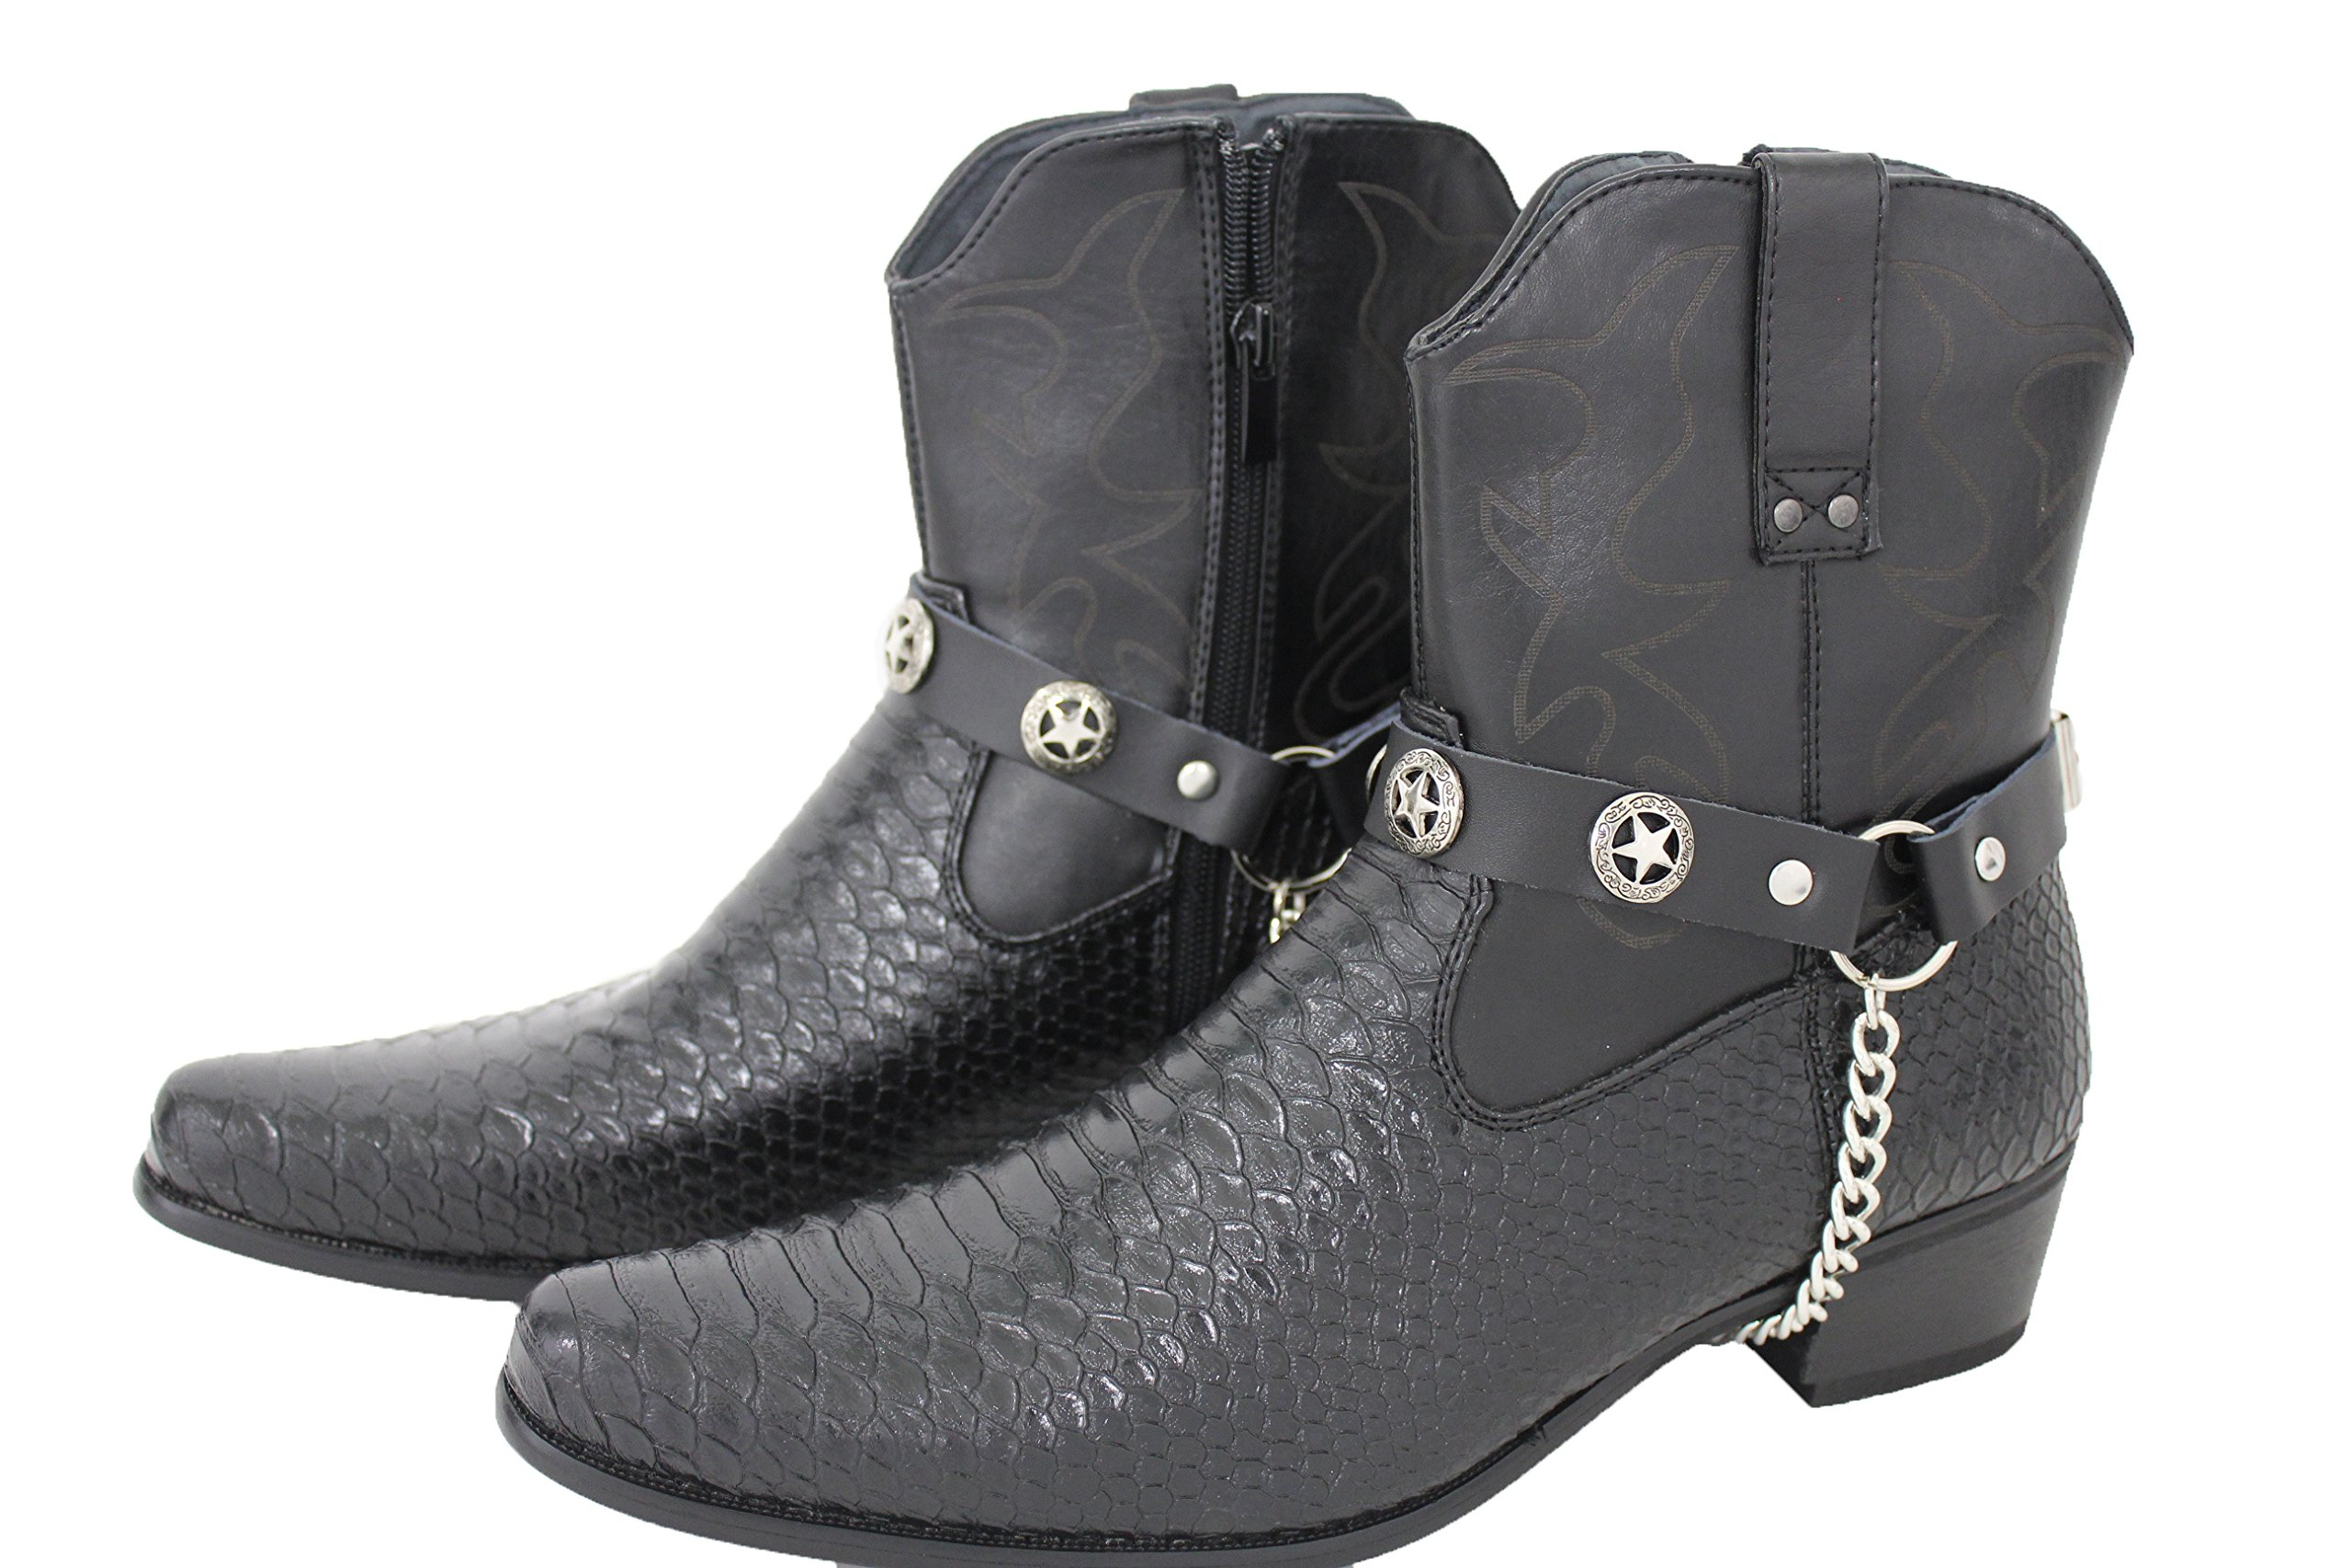 TFJ Men Boot Bracelets Black Faux Leather 2 Straps Silver Metal Chains Texas Lone Star Motorcycle Style